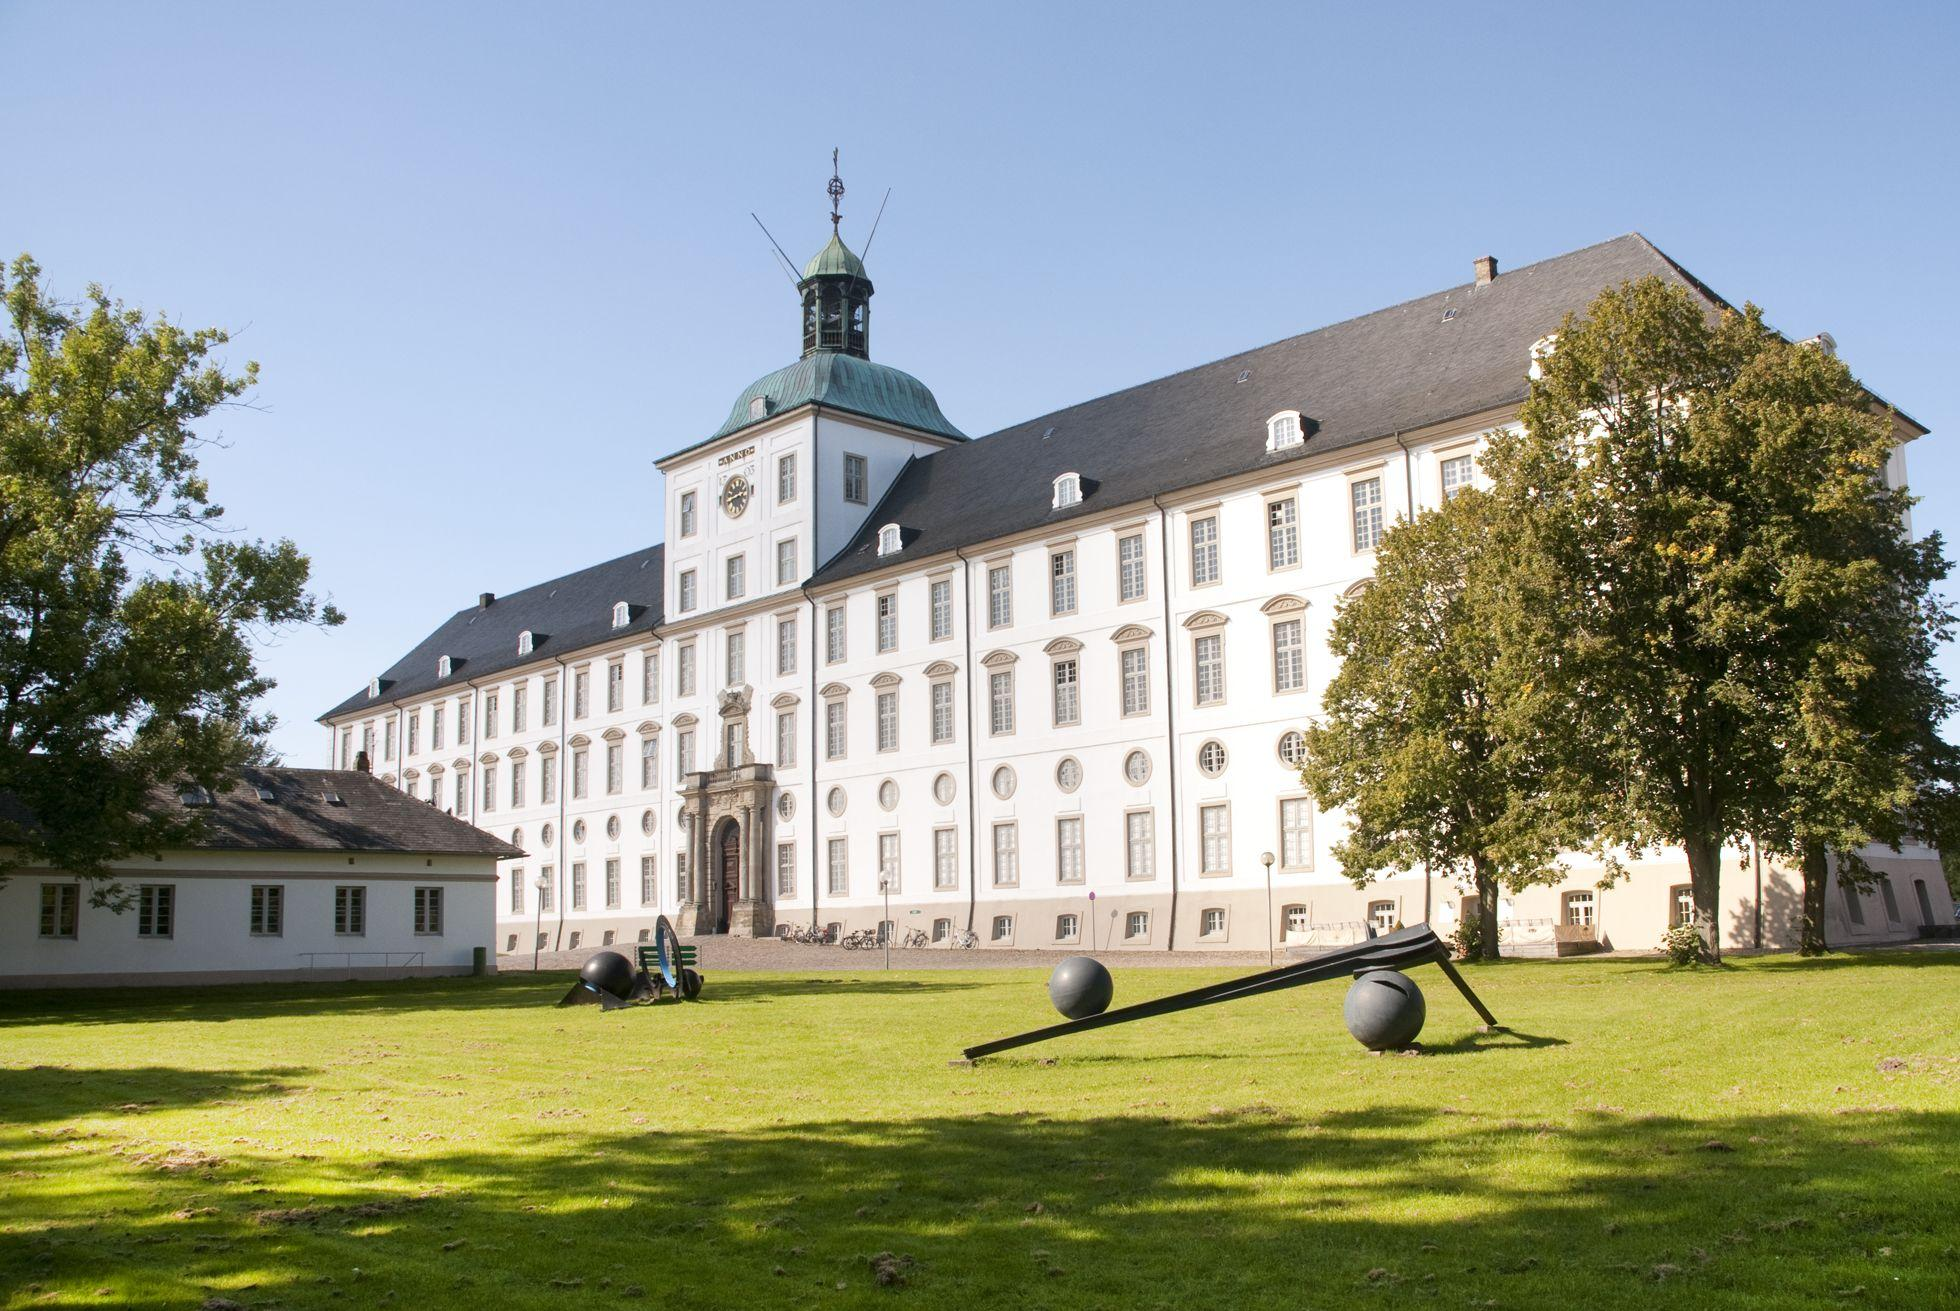 Schloss Gottorf im Sommer